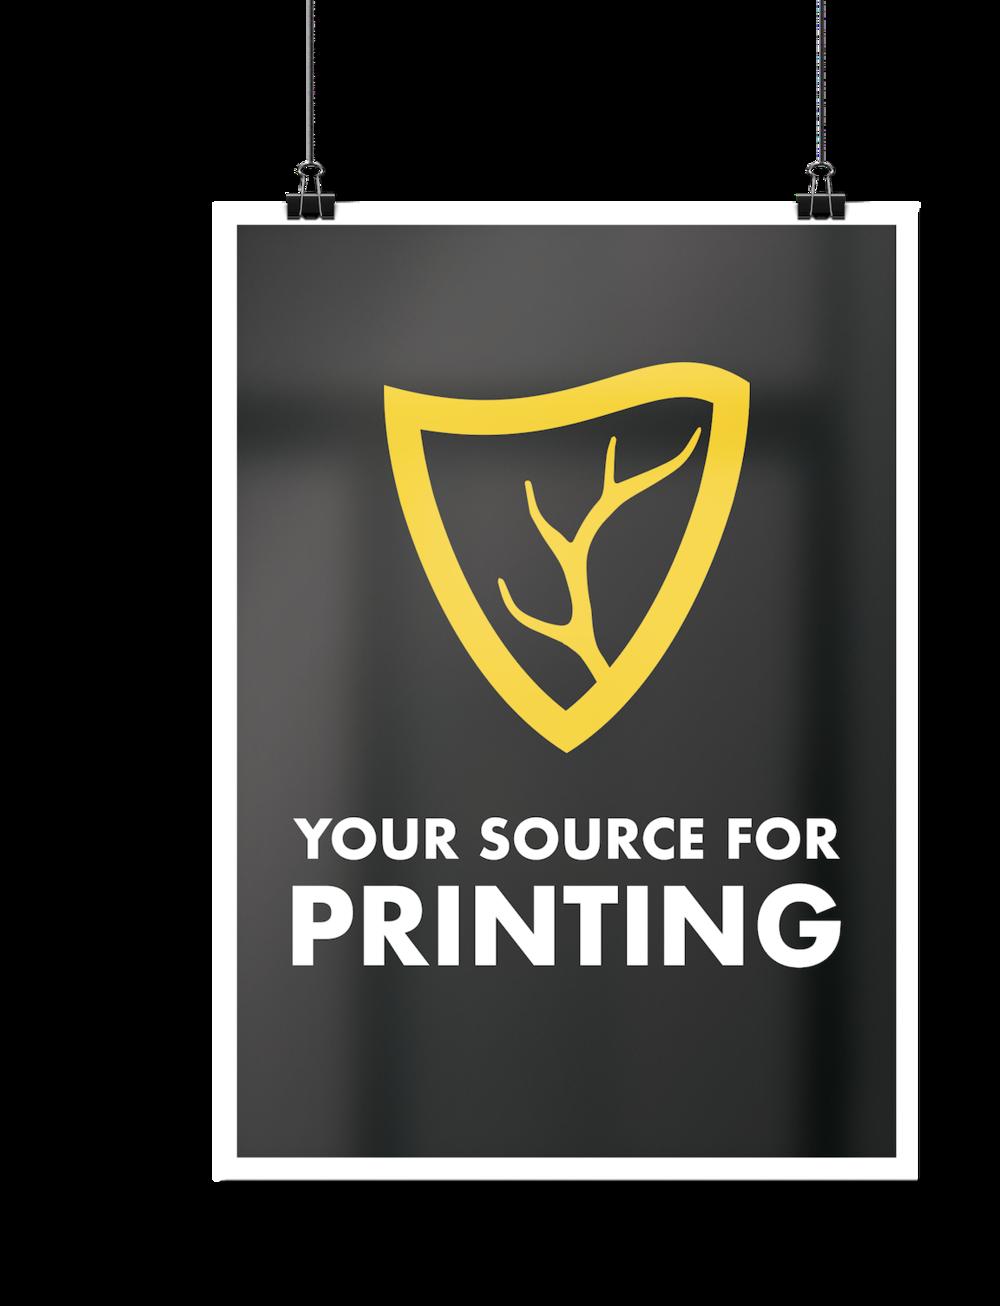 Golden-Antler-Design-Milwaukee-Branding-Logo-Printing-Brochures-Business-Cards-Postcards-Direct-Mail